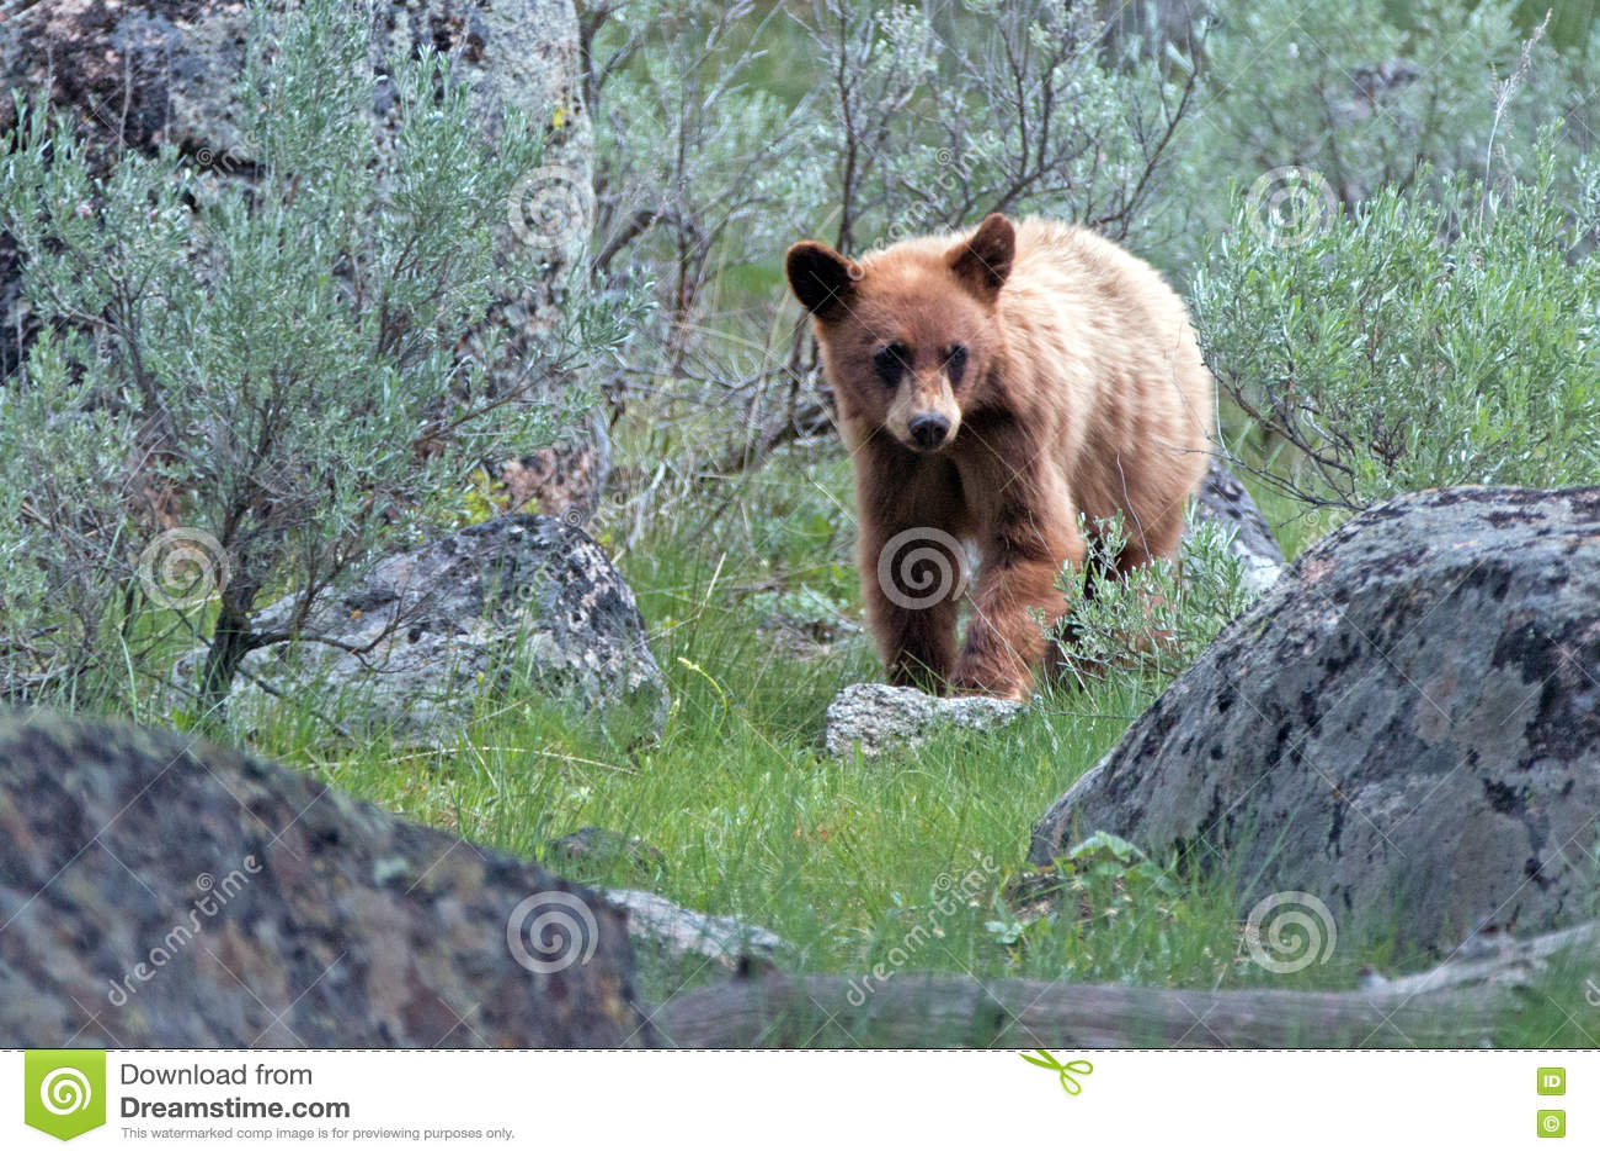 Cinnamon Brown Baby Cub American Black Bear Ursus Americanus In